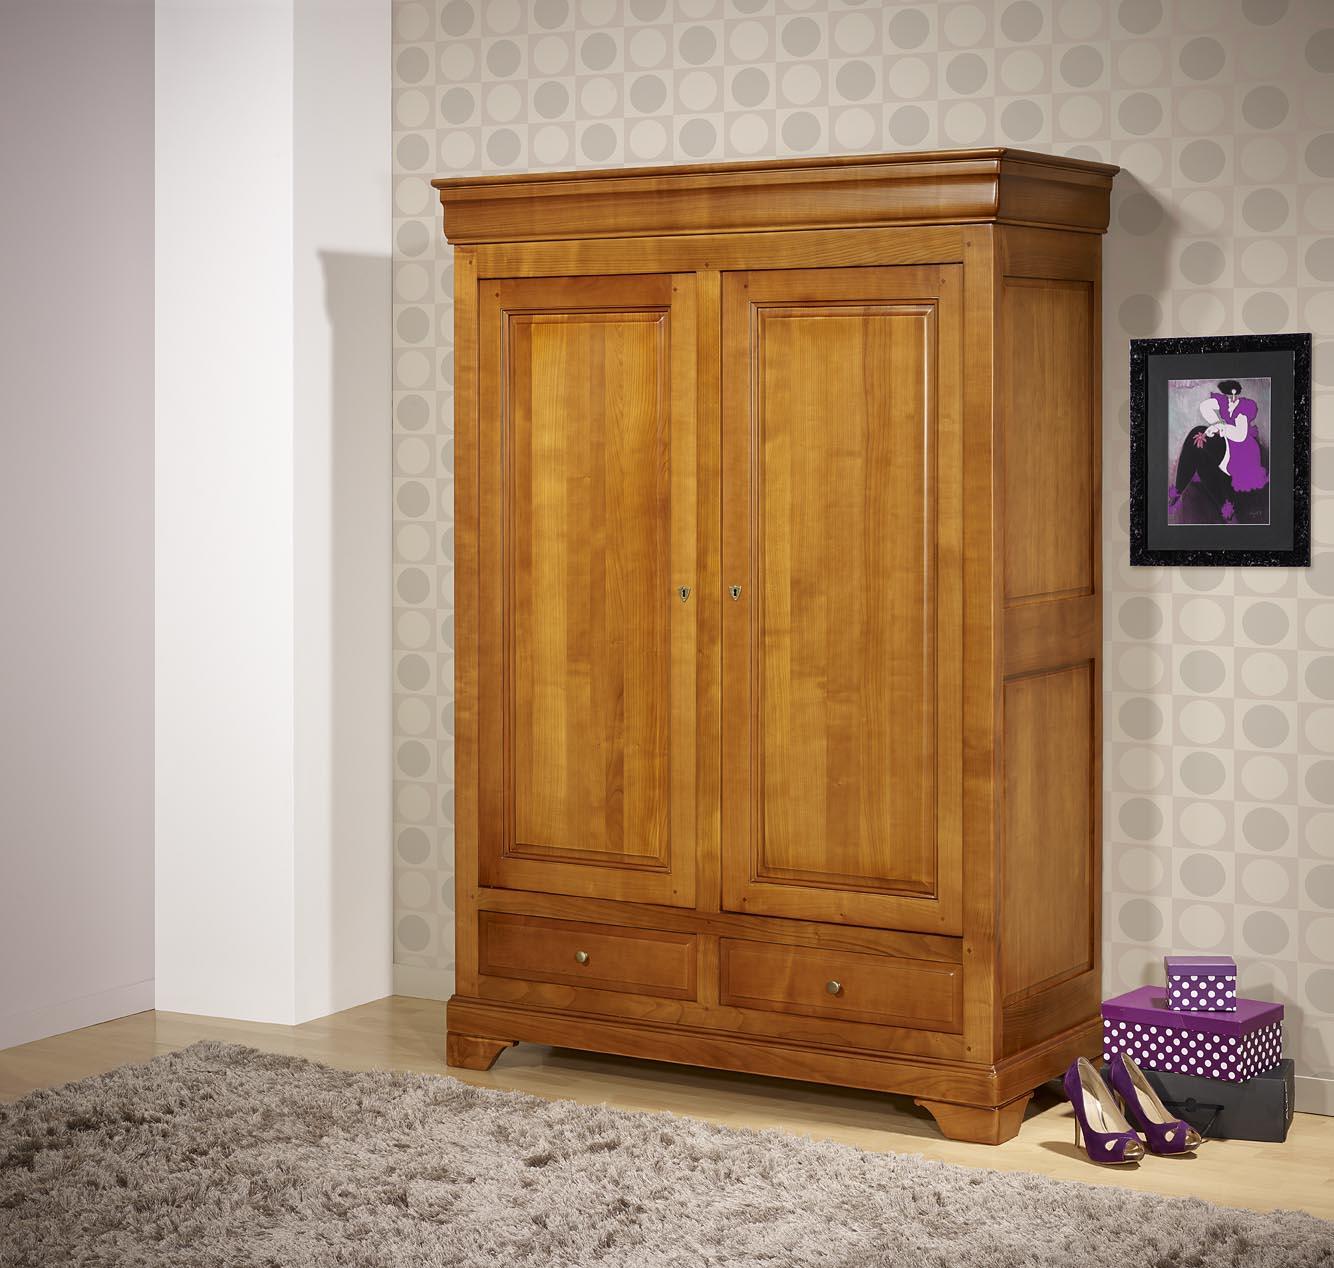 Petite armoire 2 portes 2 tiroirs in s en merisier massif for Petite porte bois